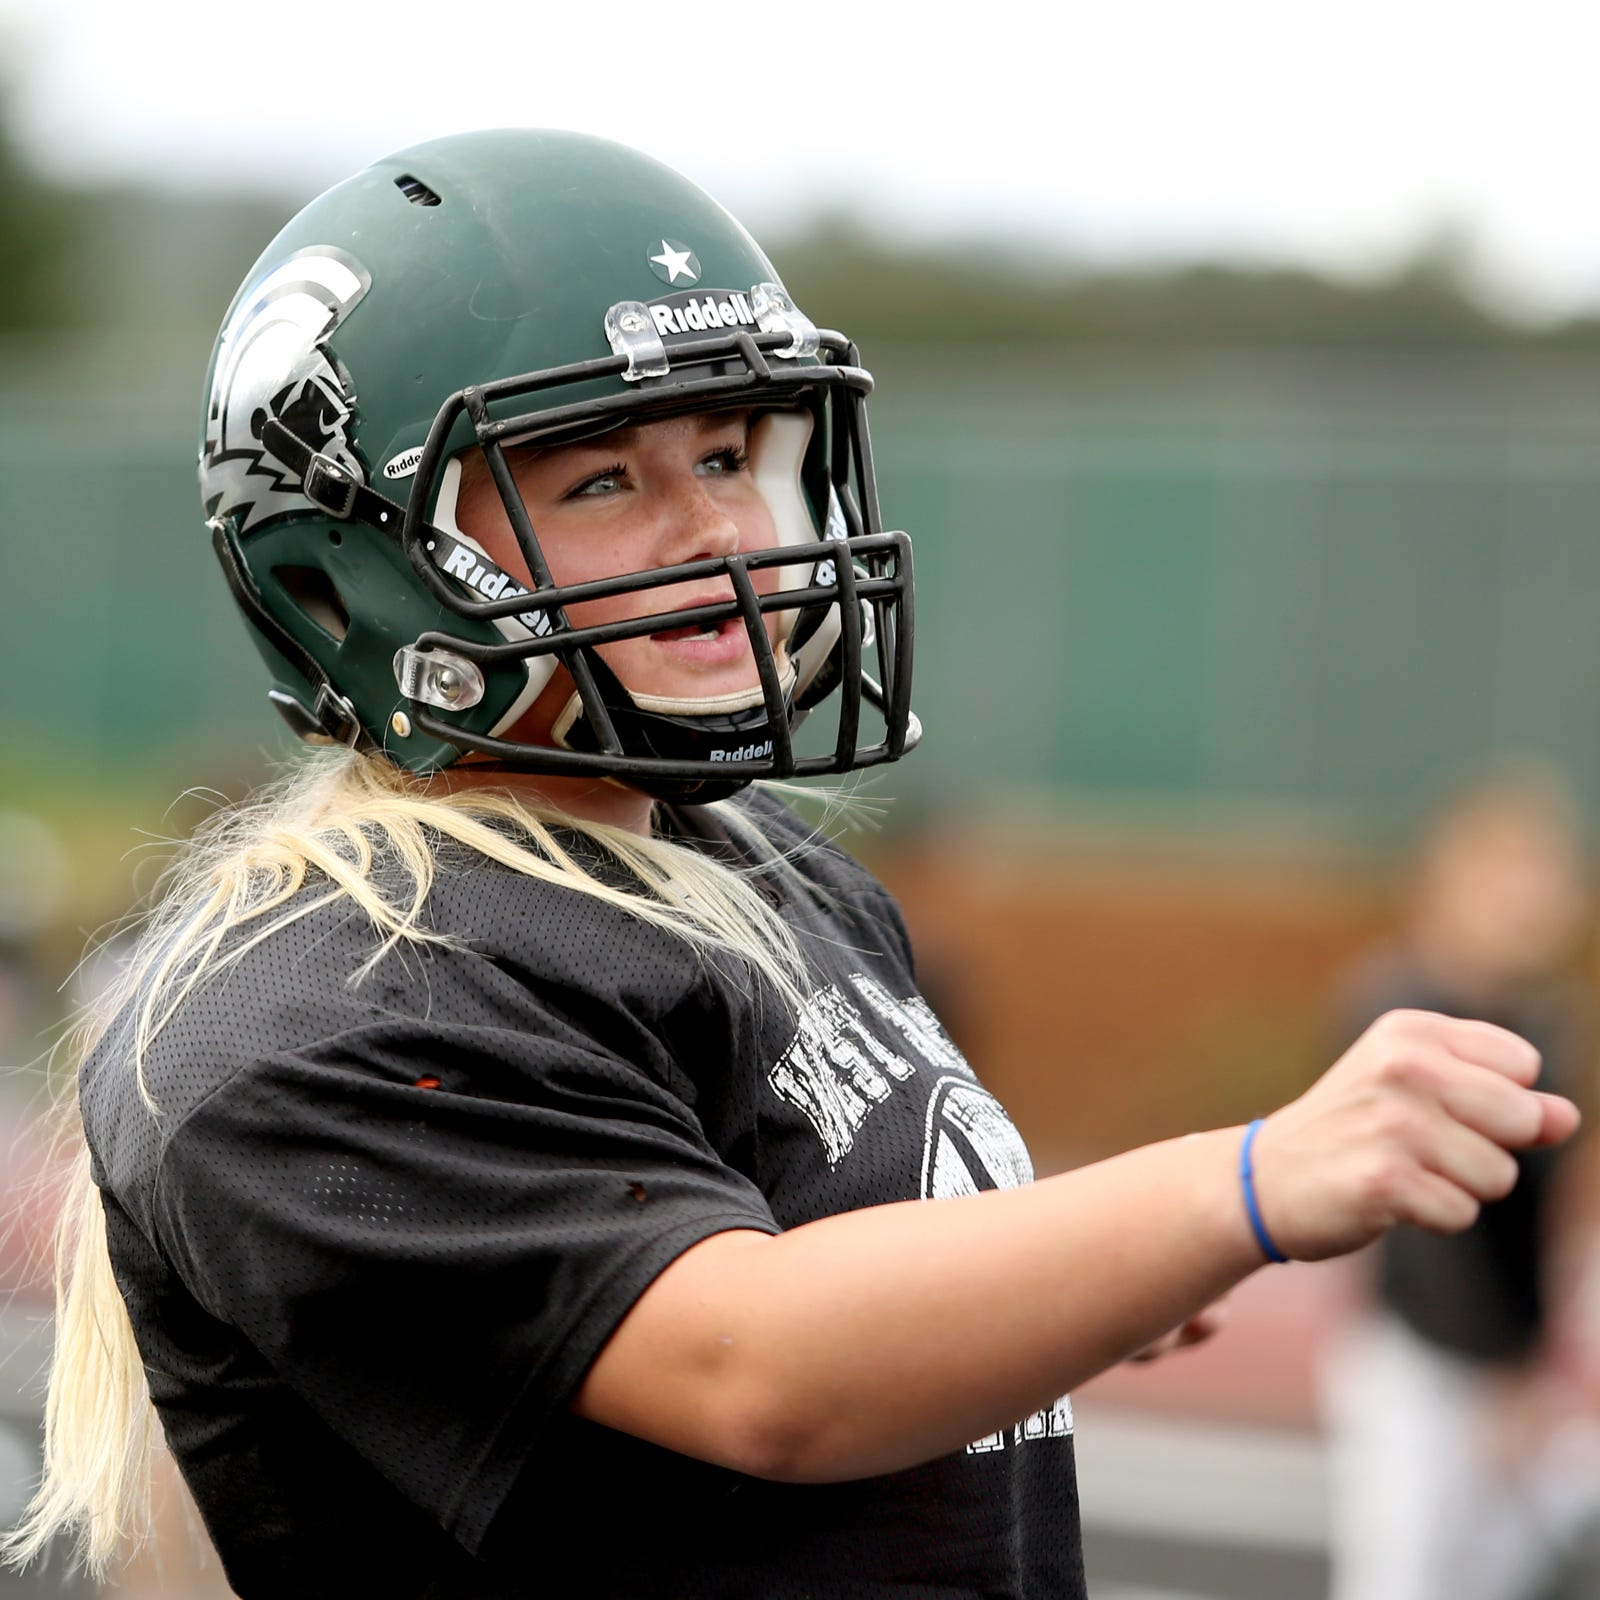 West Salem's Kyla Gordon ready to carry on Willamette University's female kicker tradition